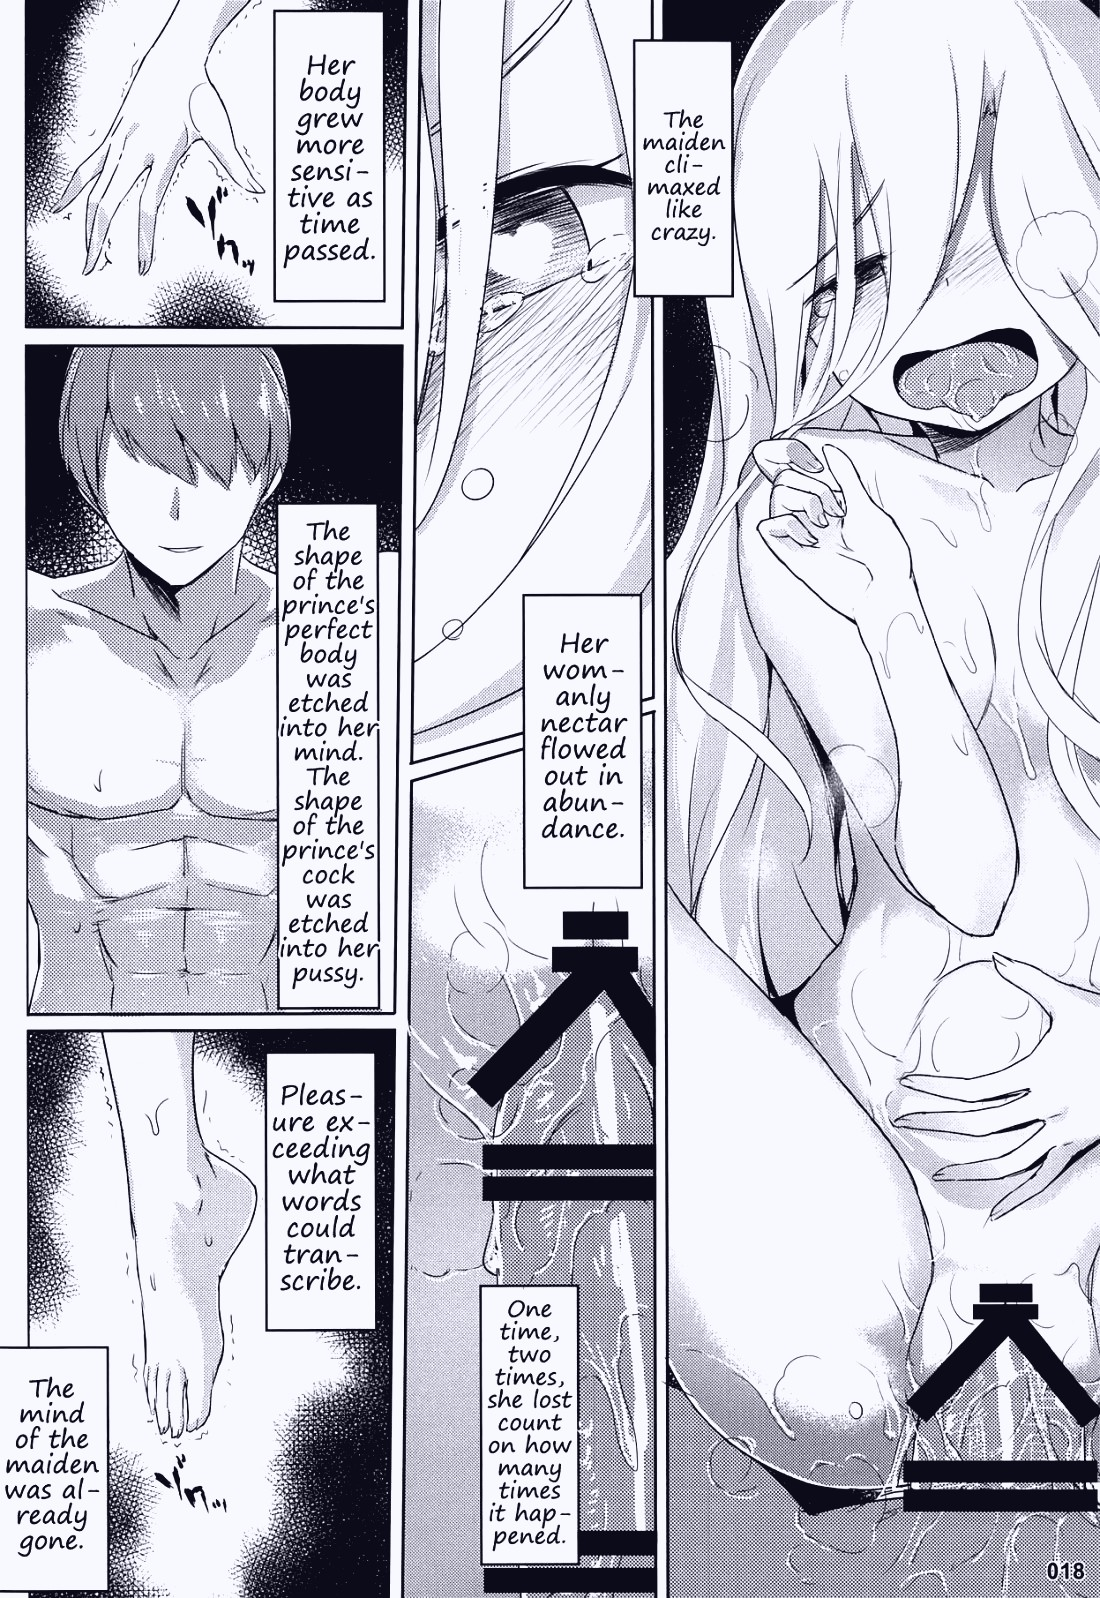 Evileye's daydream sex page 18